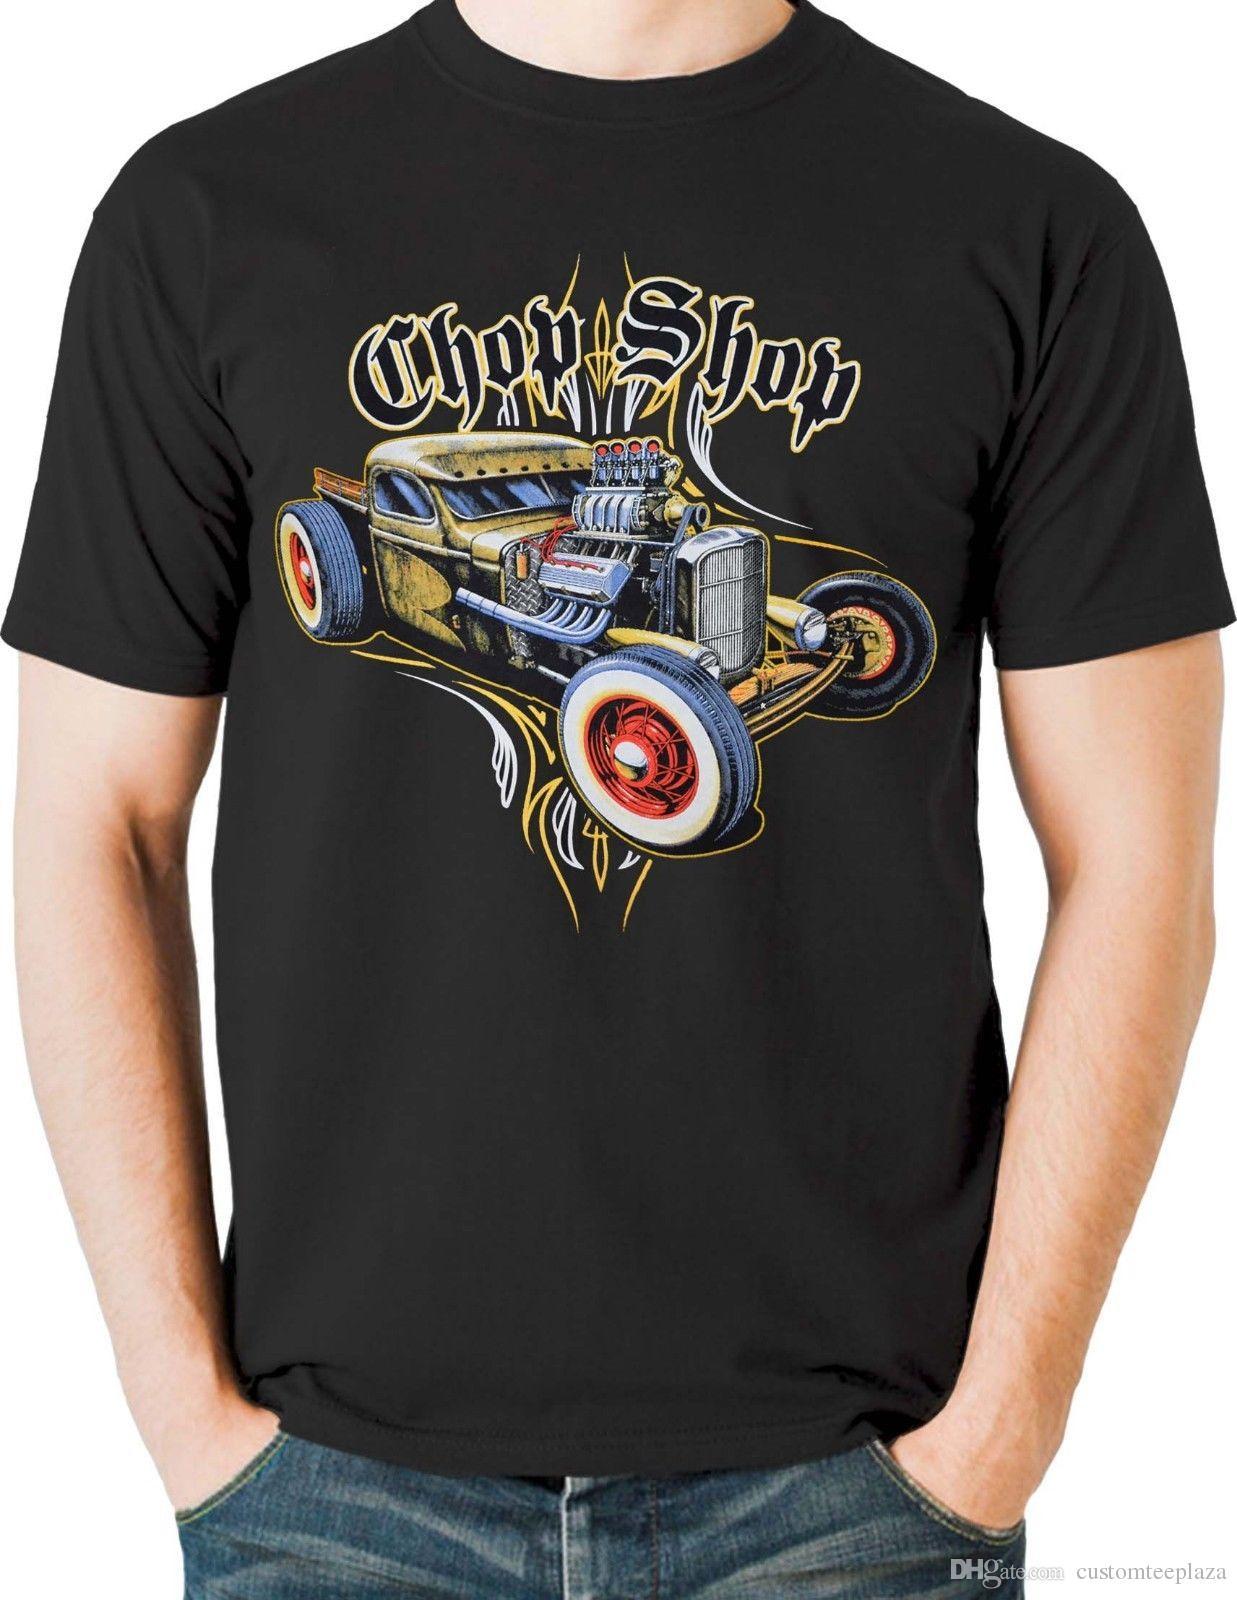 a57336c95 Hot Rod T Shirts Rat Rod Pinstripes Whitewalls Blown Hemi Small To 6Xl And  Tall T Shirt Men Boy Leisure 3XL Team Camiset Great Tee Shirts Cool Tee  Shirt ...